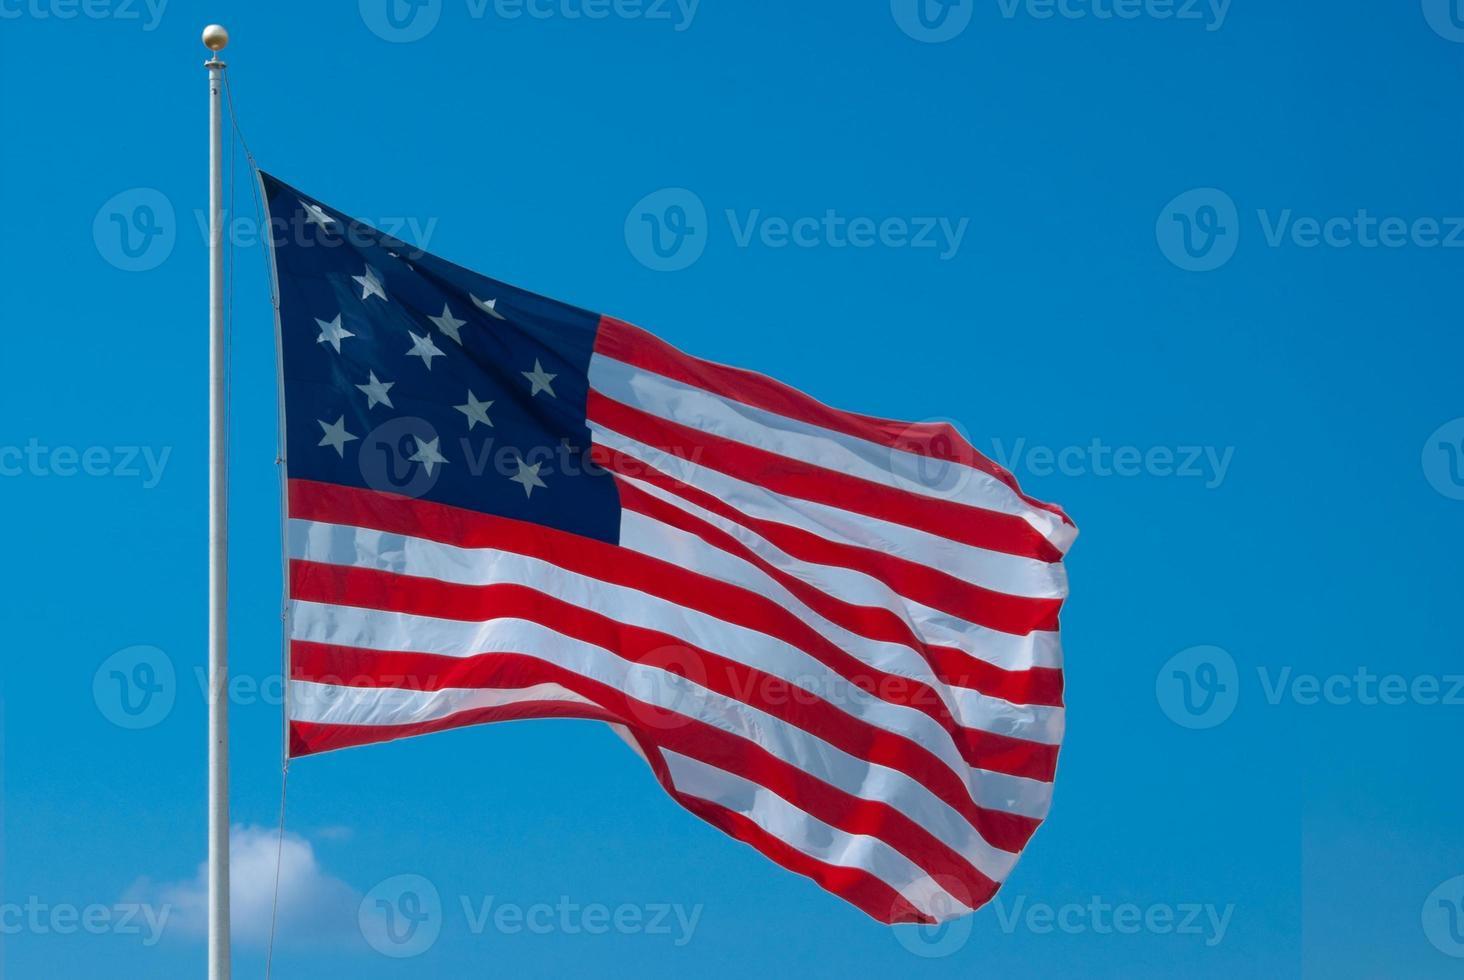 stjärnan spangled banner flagga - Baltimore, Maryland foto